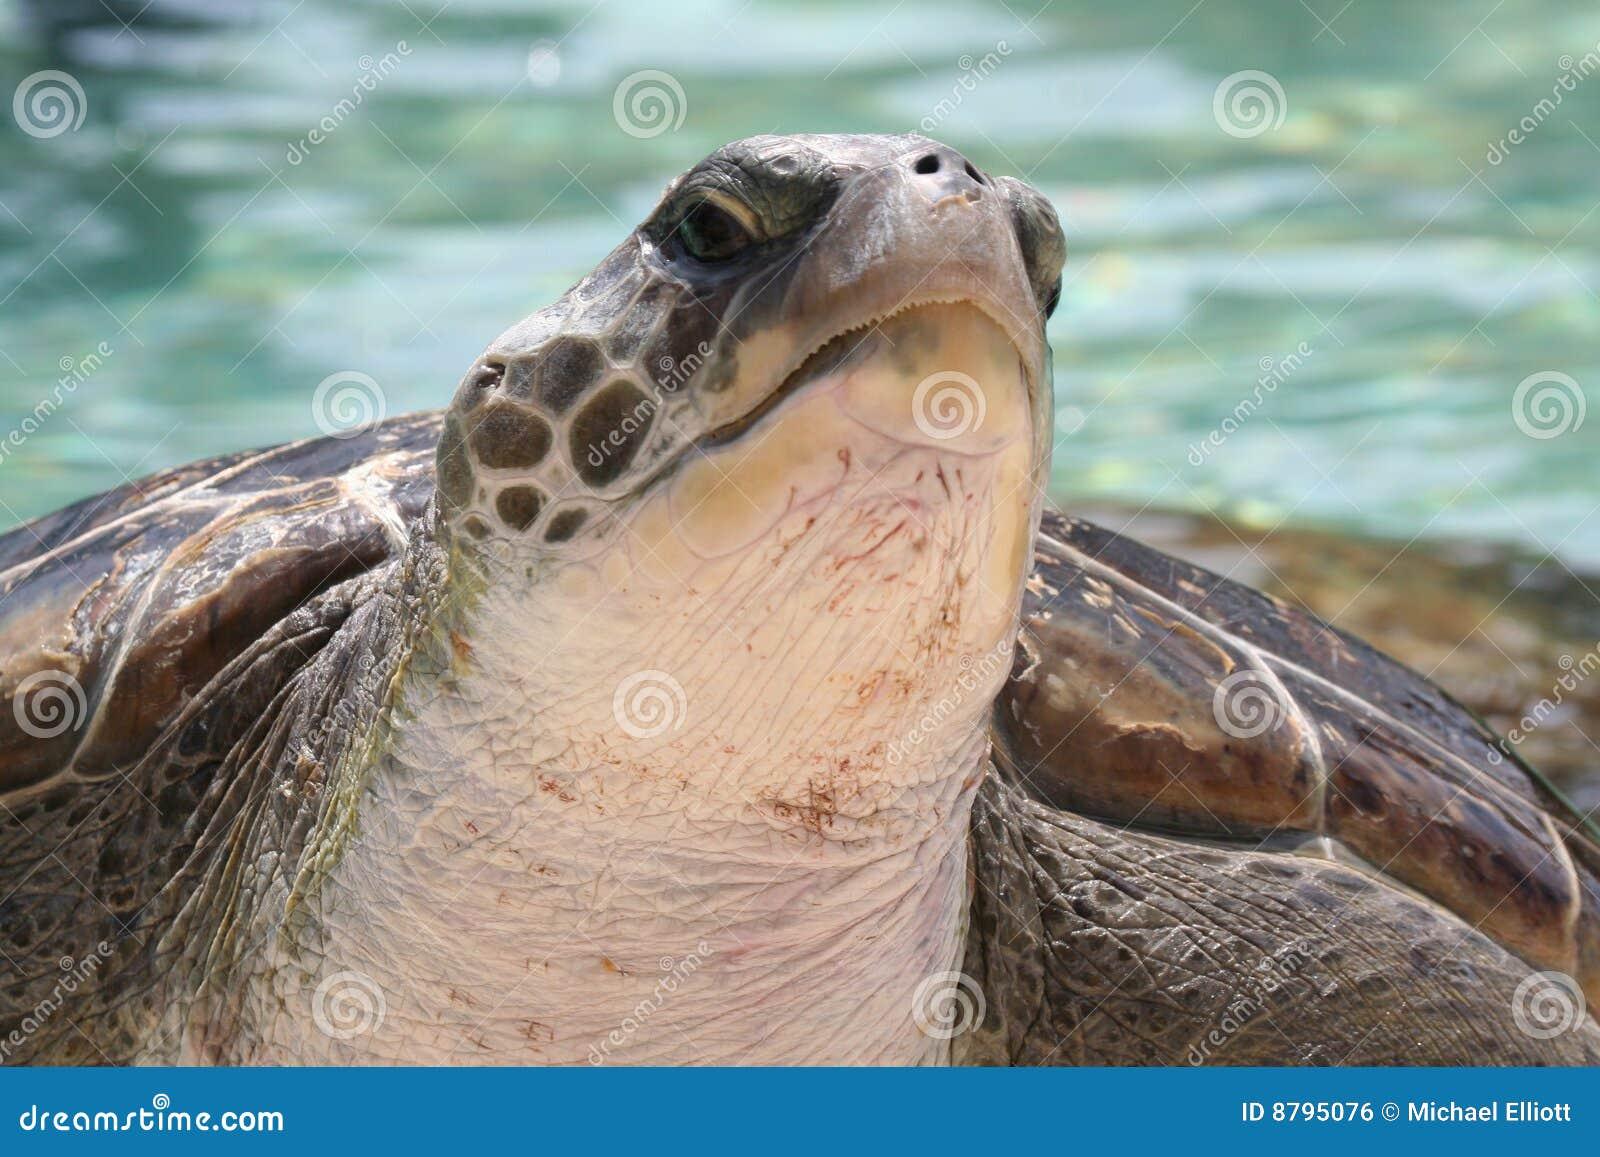 Tartaruga di mare verde